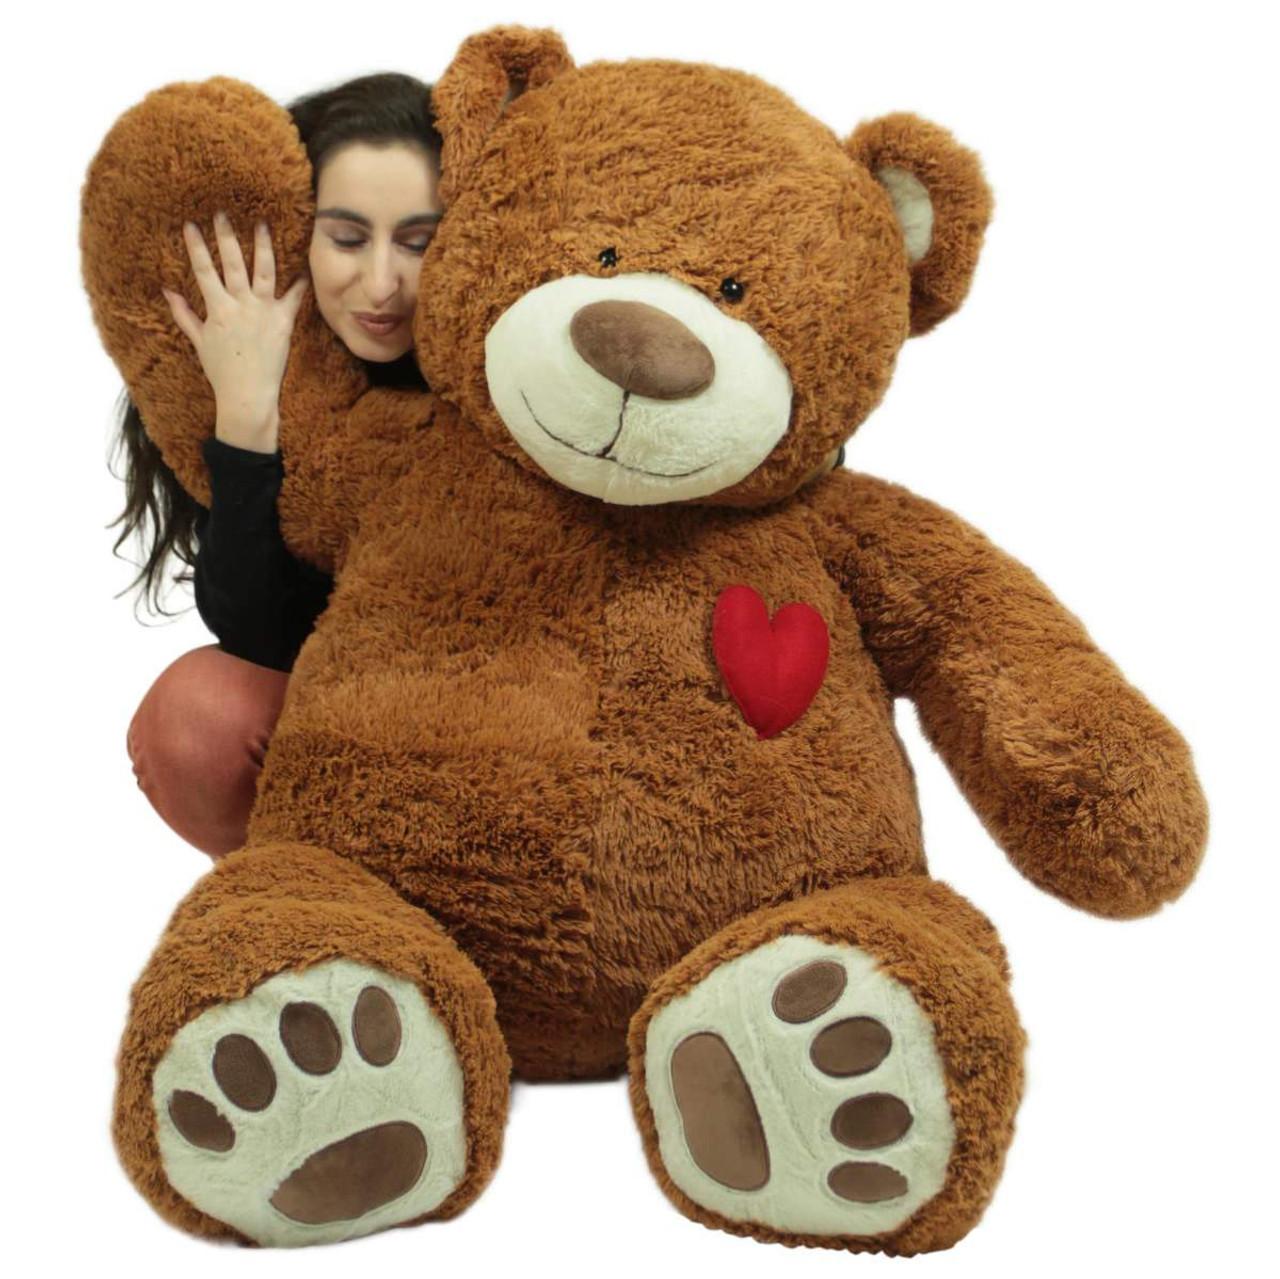 d656086ae5e Big Plush Giant 5 Foot Teddy Bear with Heart on Chest